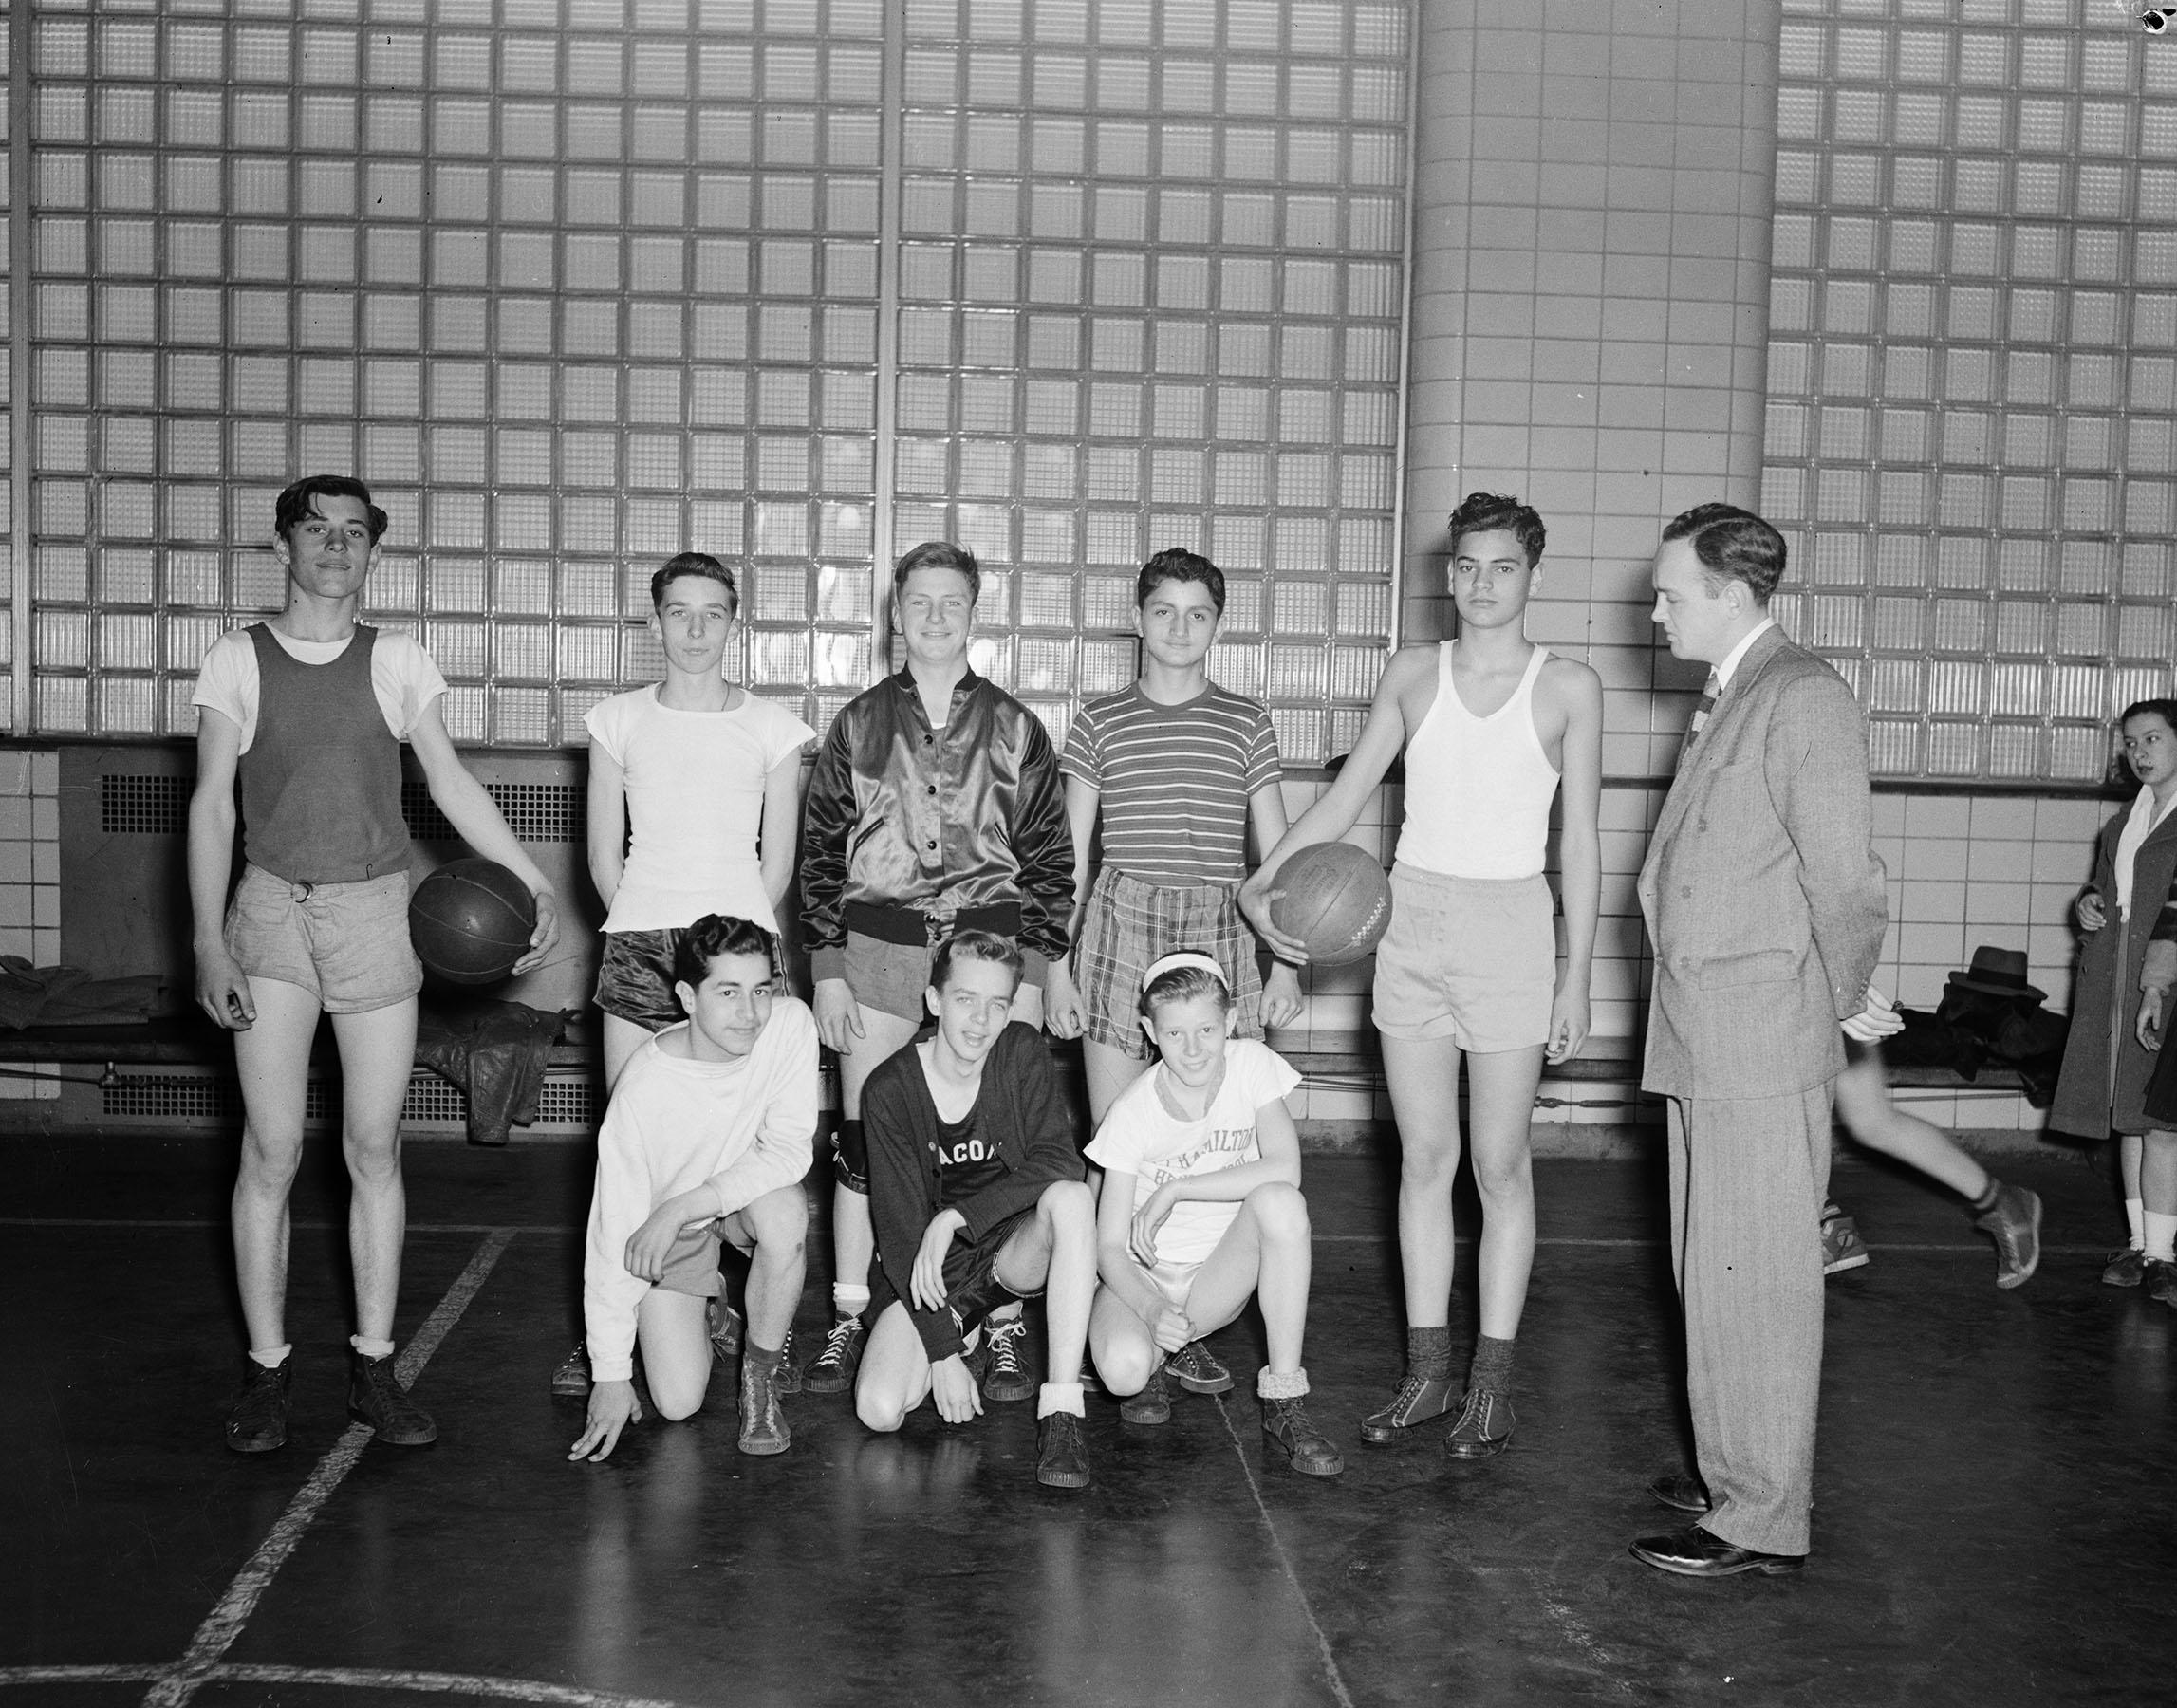 DPR_24011: Basketball Betsy Head Boys Team: (Fort Hamilton High School Playground) 1st row L-R Eugene Howie, Roy DeVines, Robert Petter, 2nd Row Jimmy Sotis- Lon MacDonald-Edward Murphy- Howard Weiss- Adam Kalfaian. Coach Tom Burns, March 9, 1945